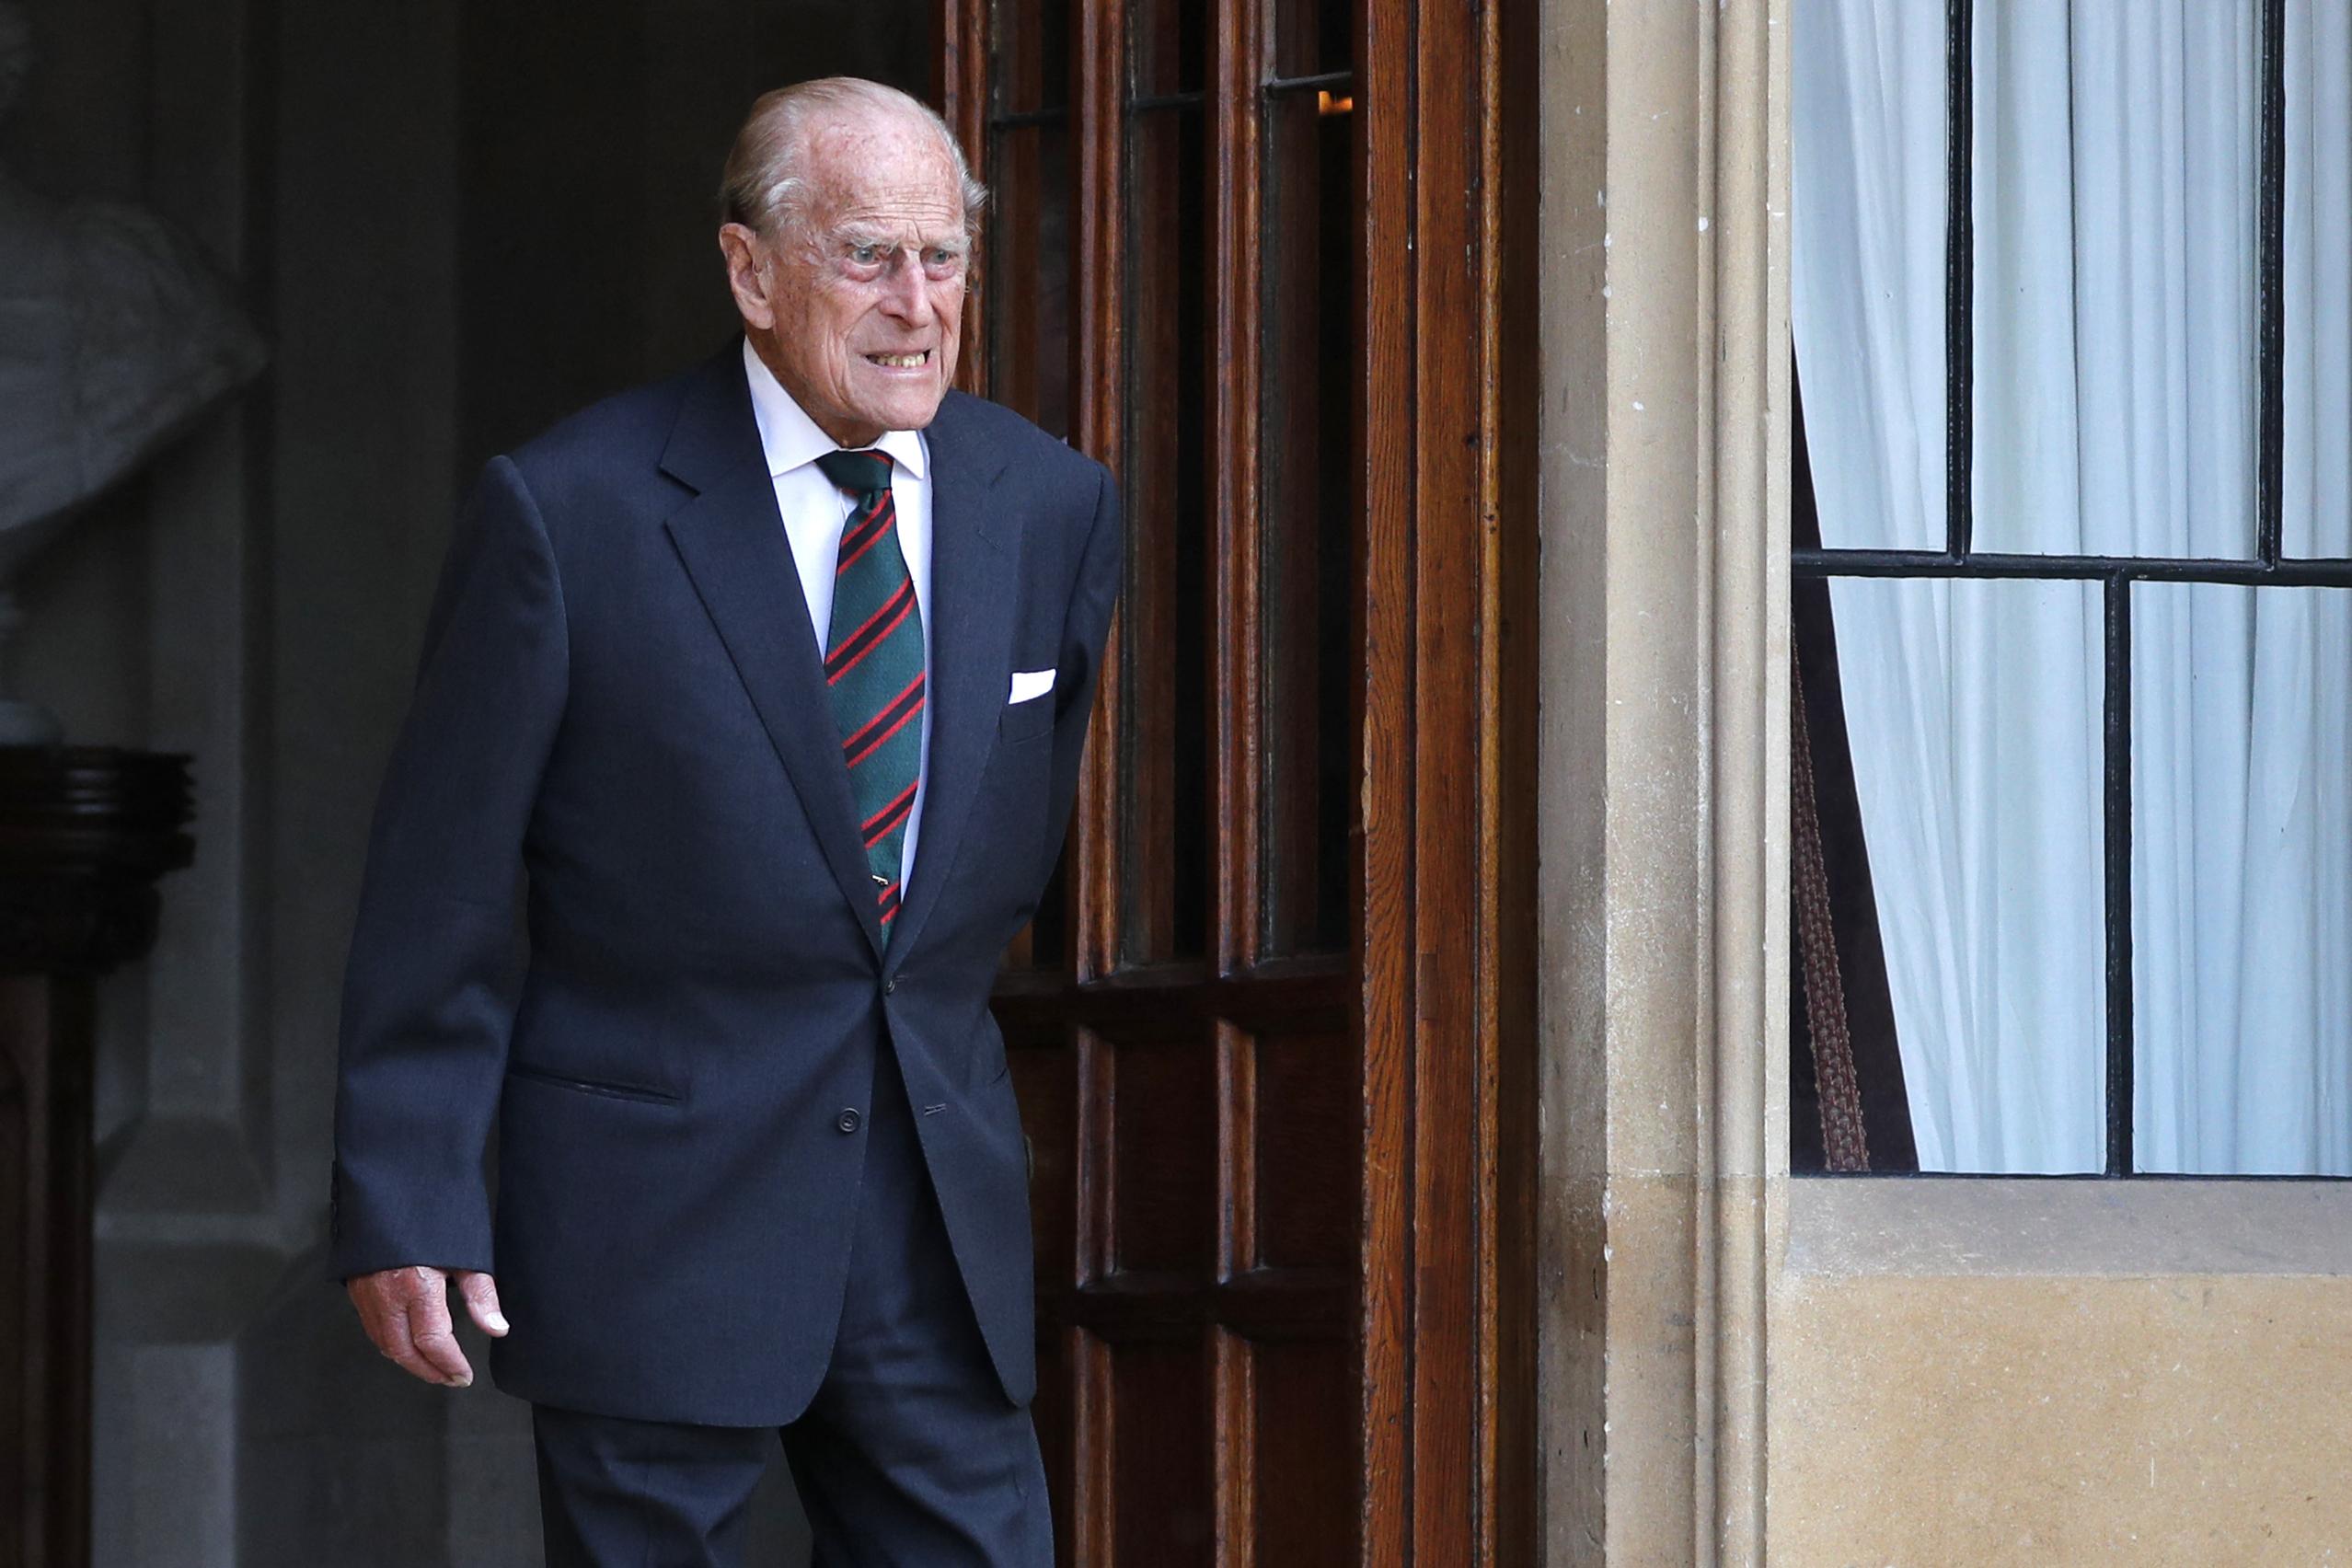 UK's Prince Philip taken to hospital as 'precaution'